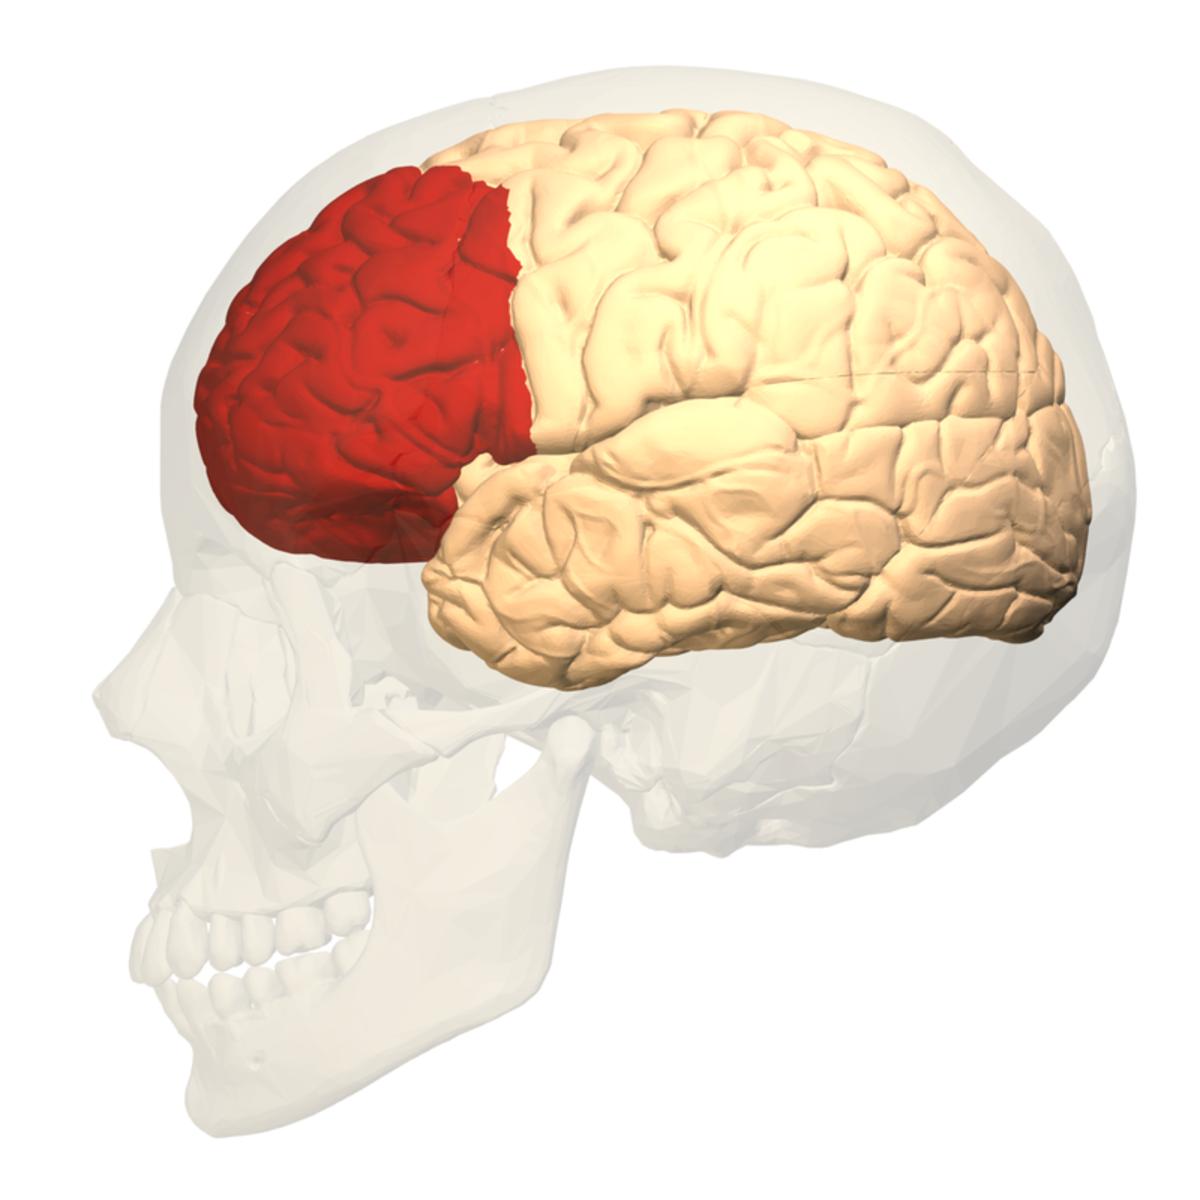 Pre-frontal cortex